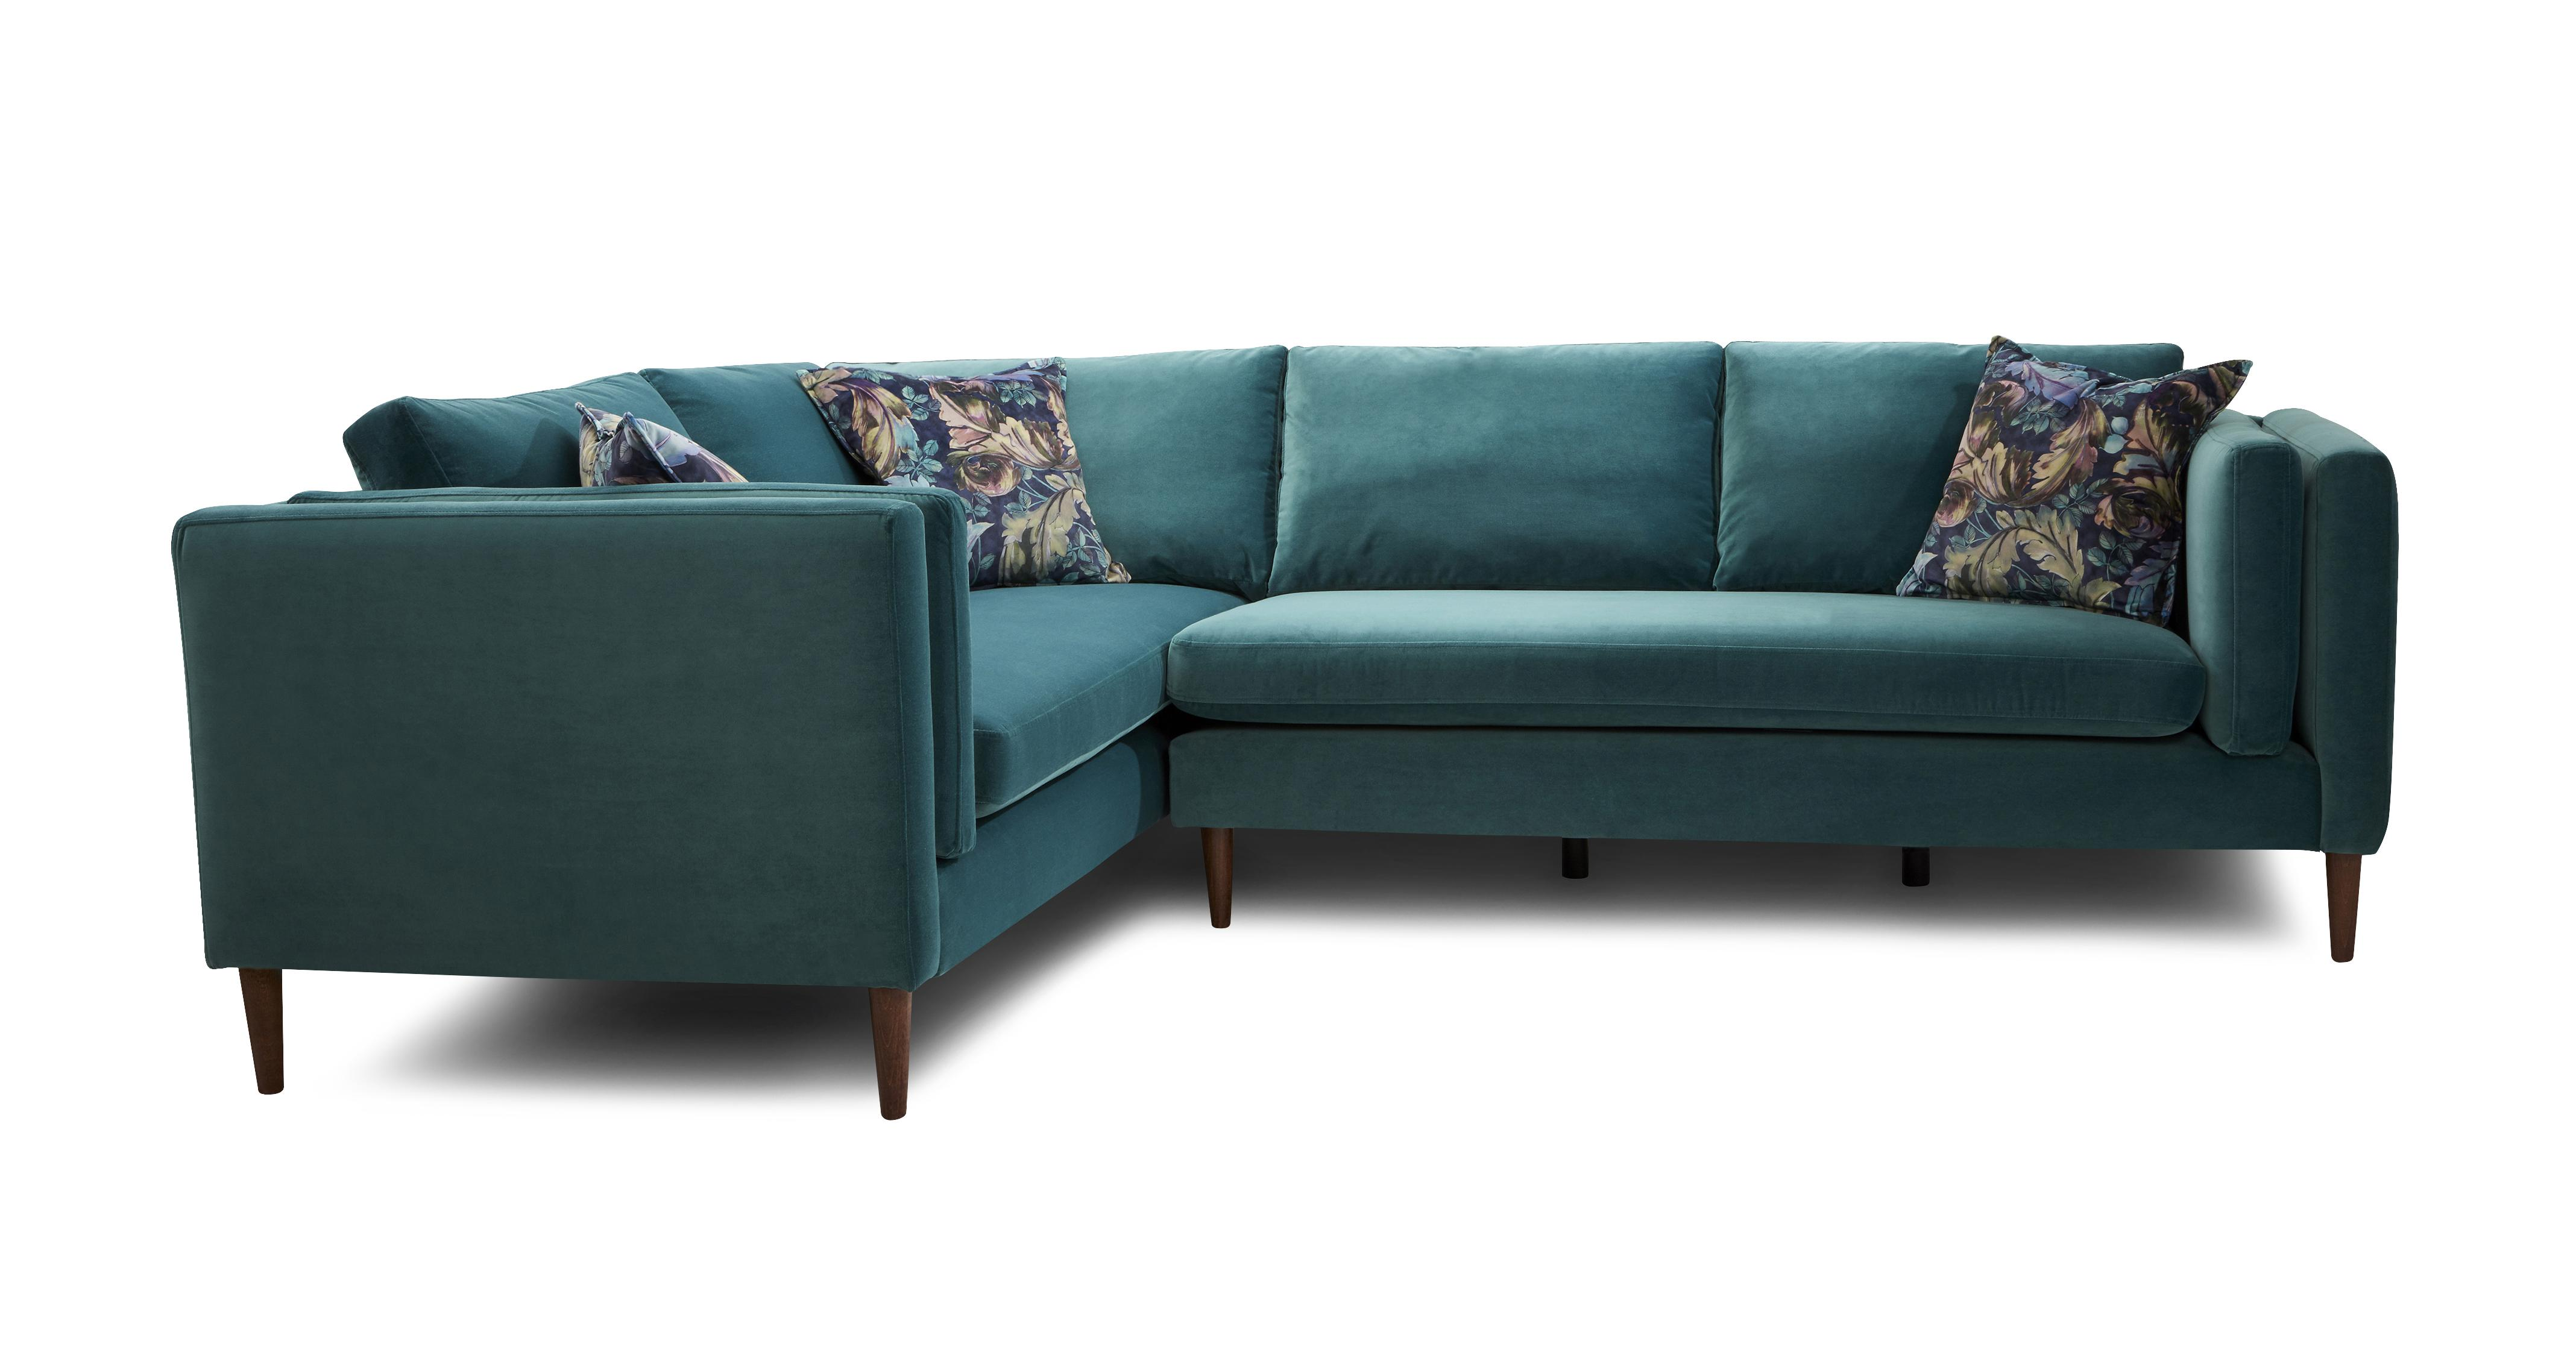 Eden Right Hand Facing Arm 3 Seater Corner Sofa Luxe Velvet Dfs